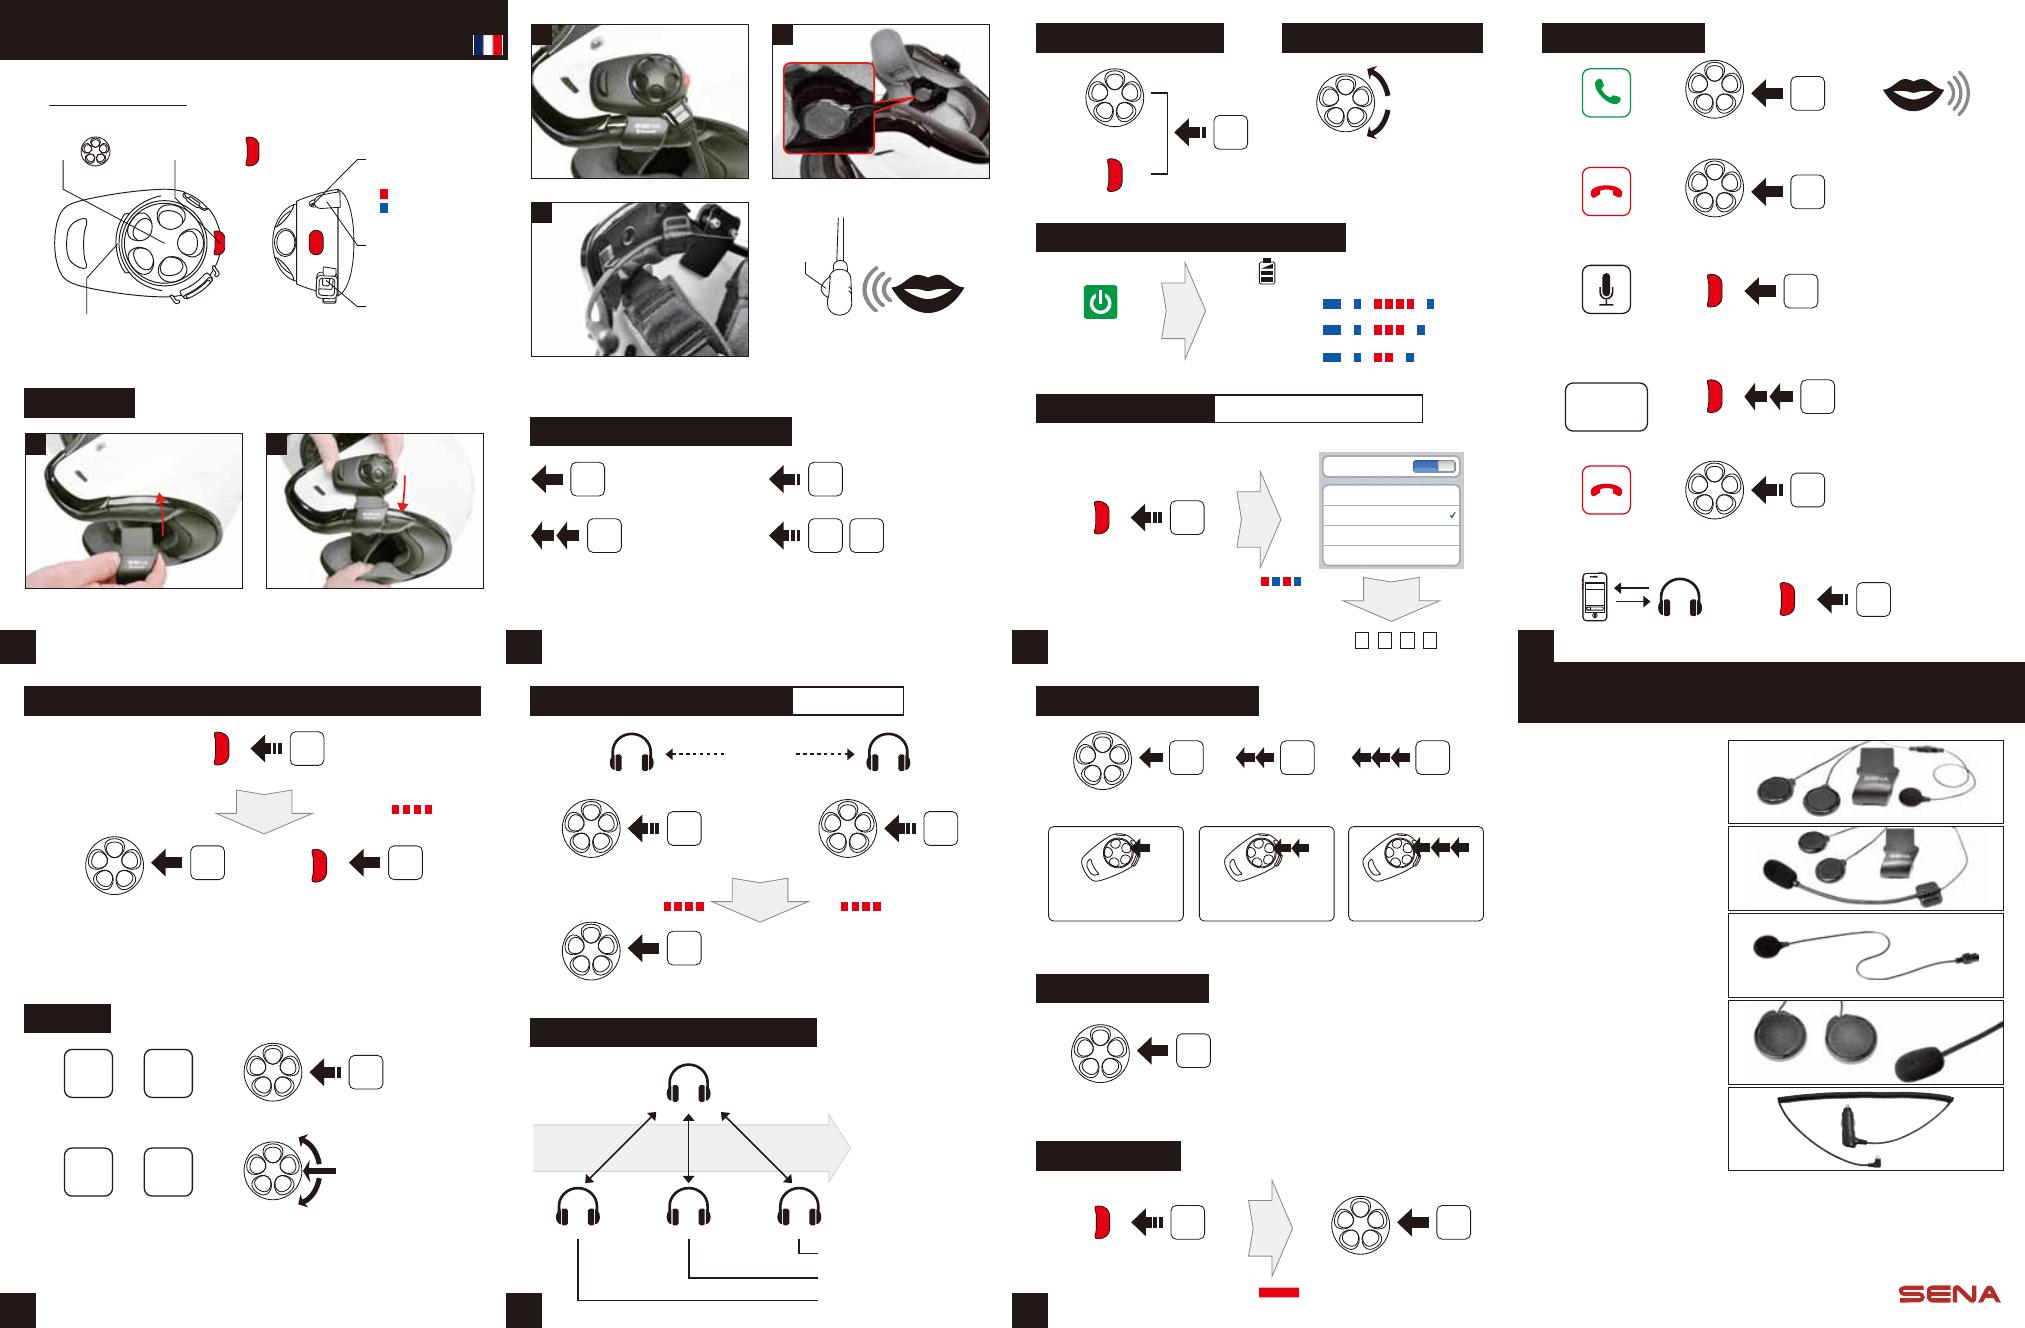 Sena Bluetooth SMH5 Quick Start Guide Manuel d'utilisation